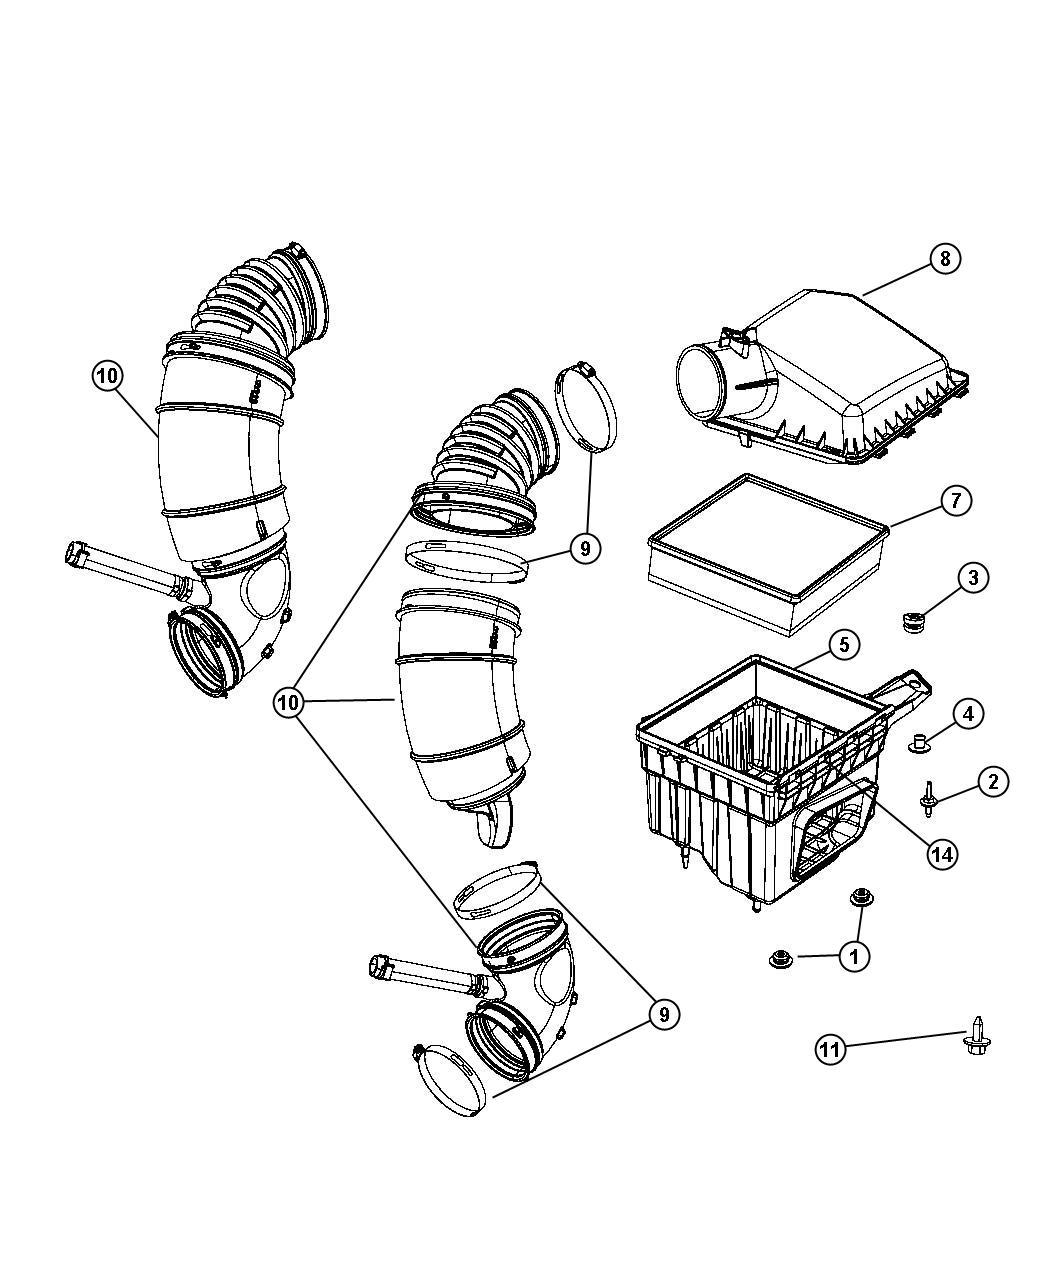 Dodge Ram Cover Air Cleaner Etj Eth